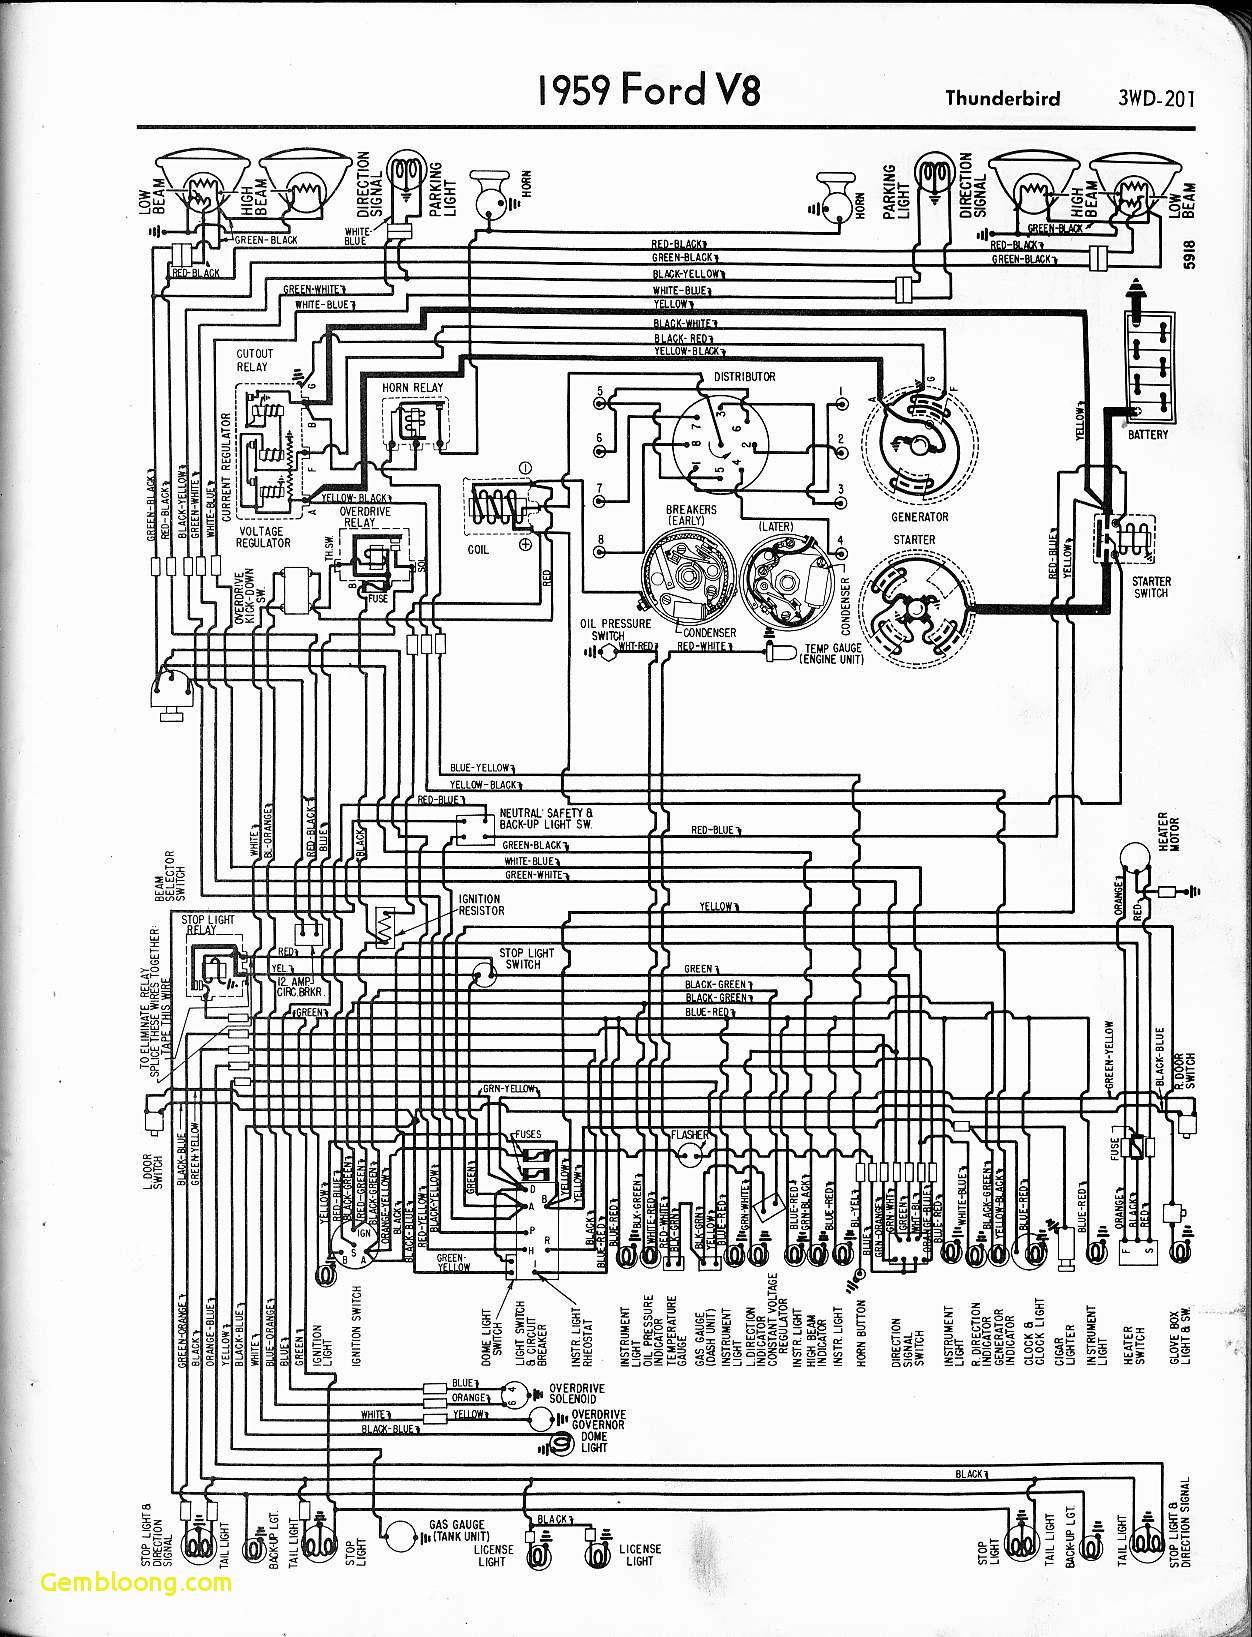 Basic Engine Diagram Download ford Trucks Wiring Diagrams ford F150 Wiring Diagrams Best Of Basic Engine Diagram